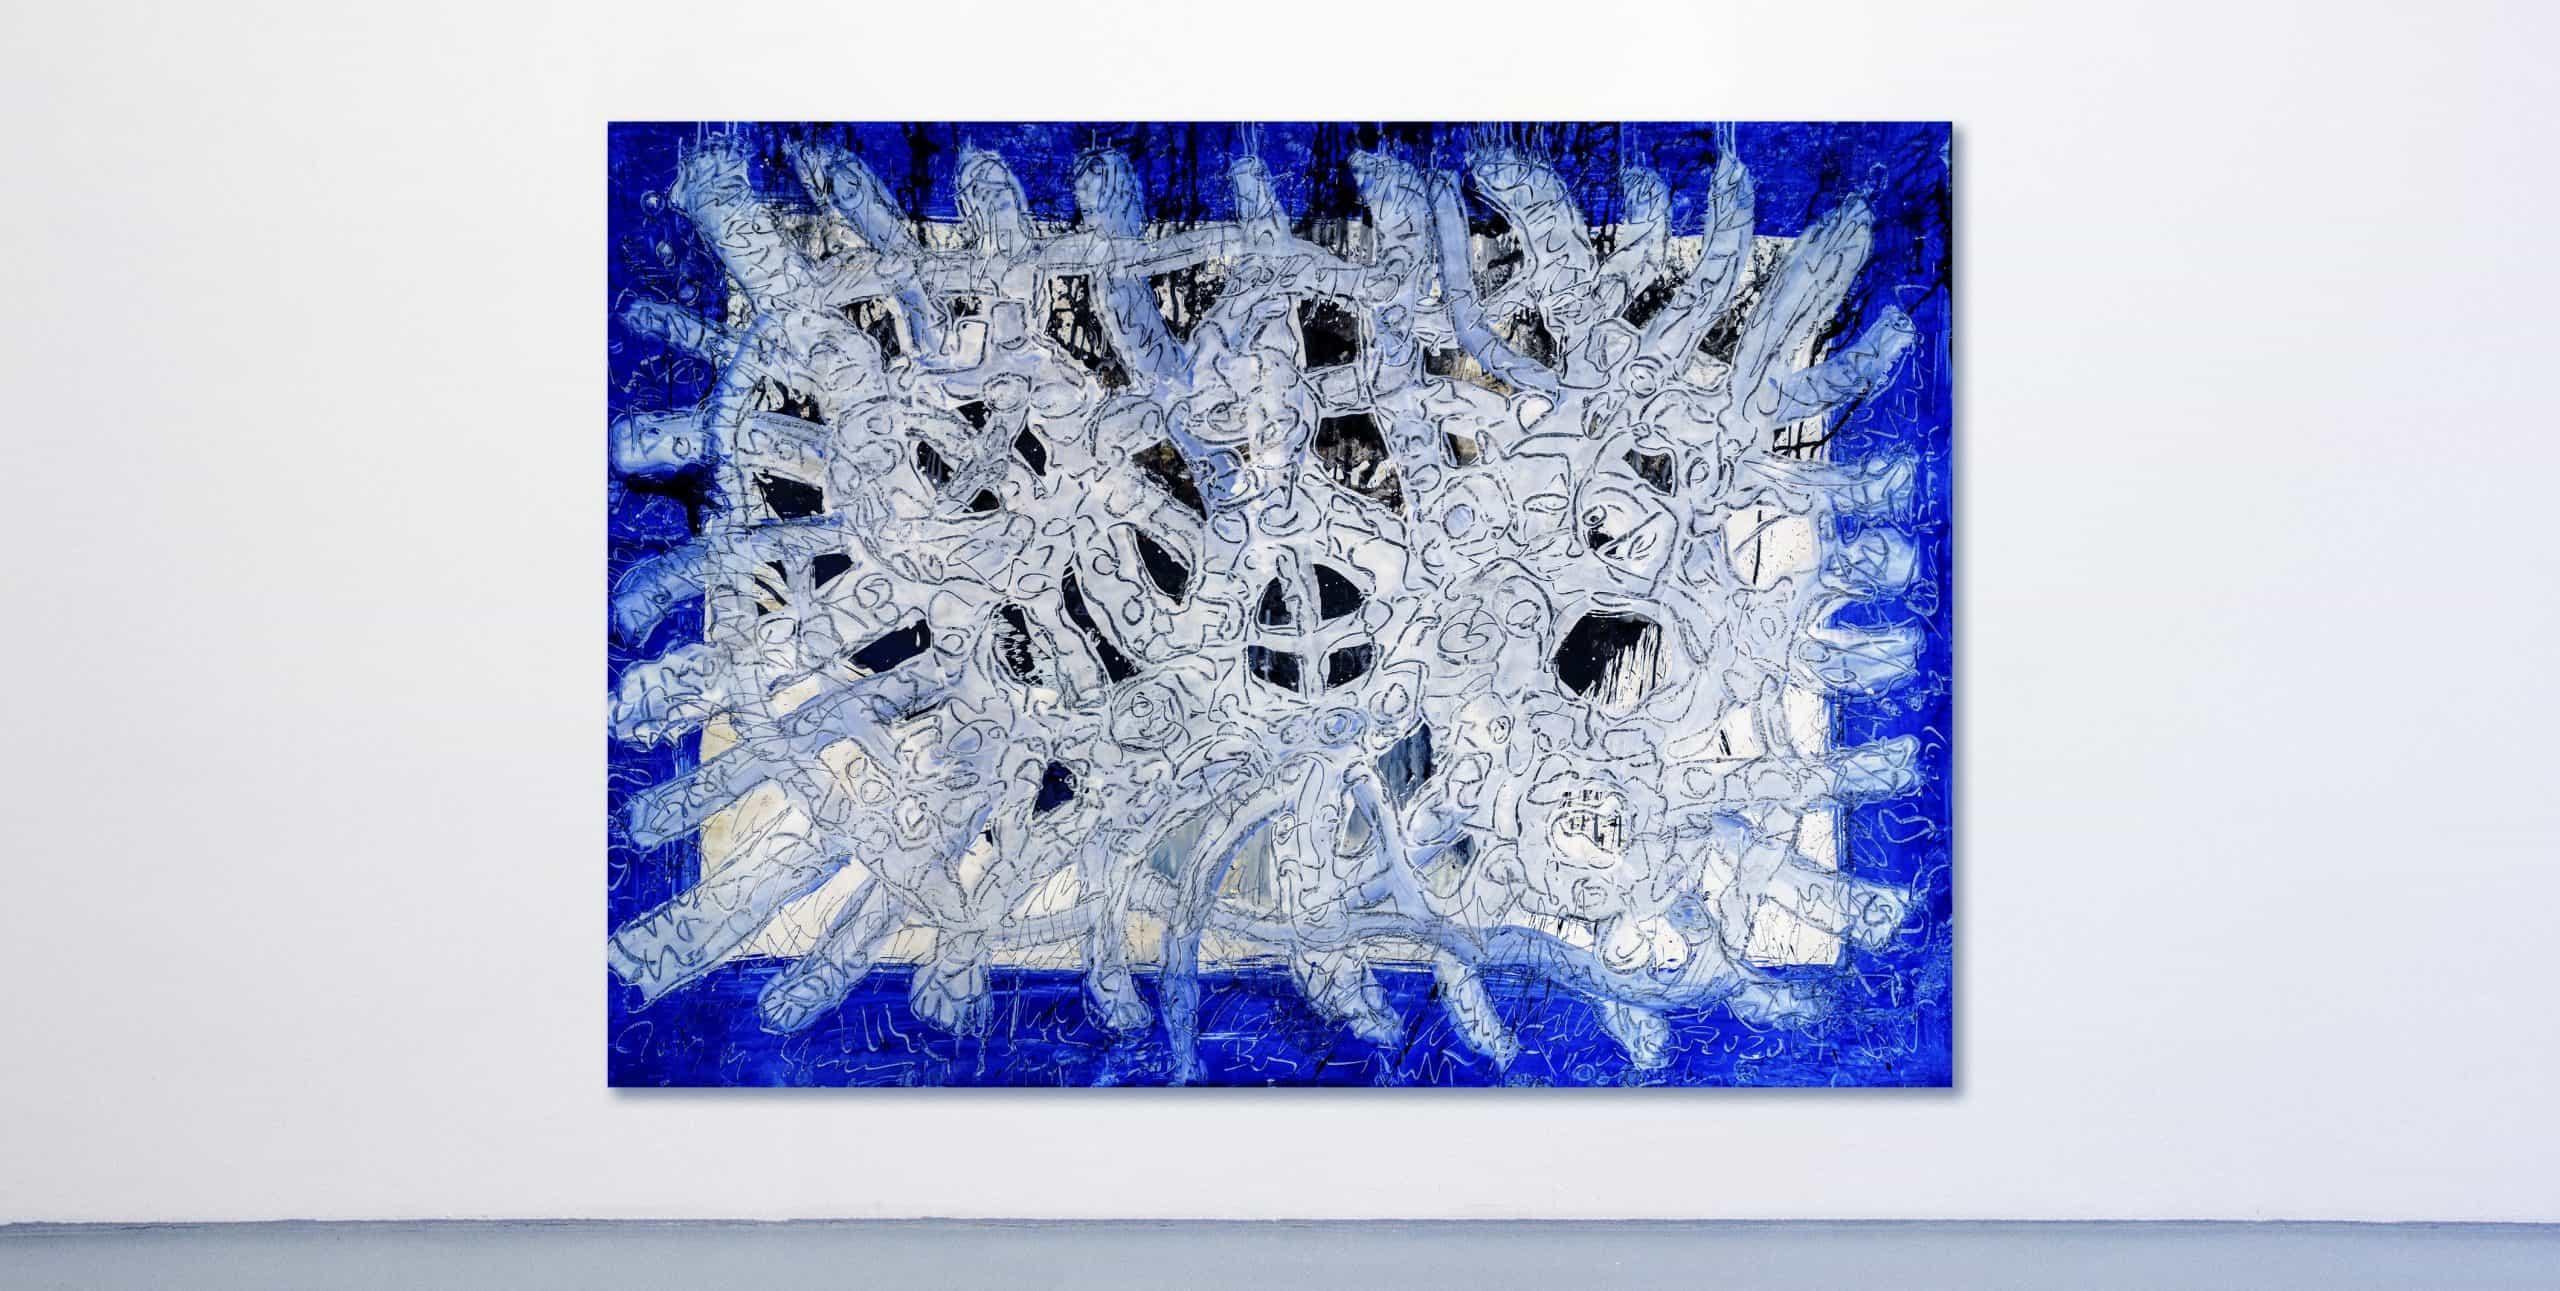 Galerie_Wand_schmal_ArtBrut